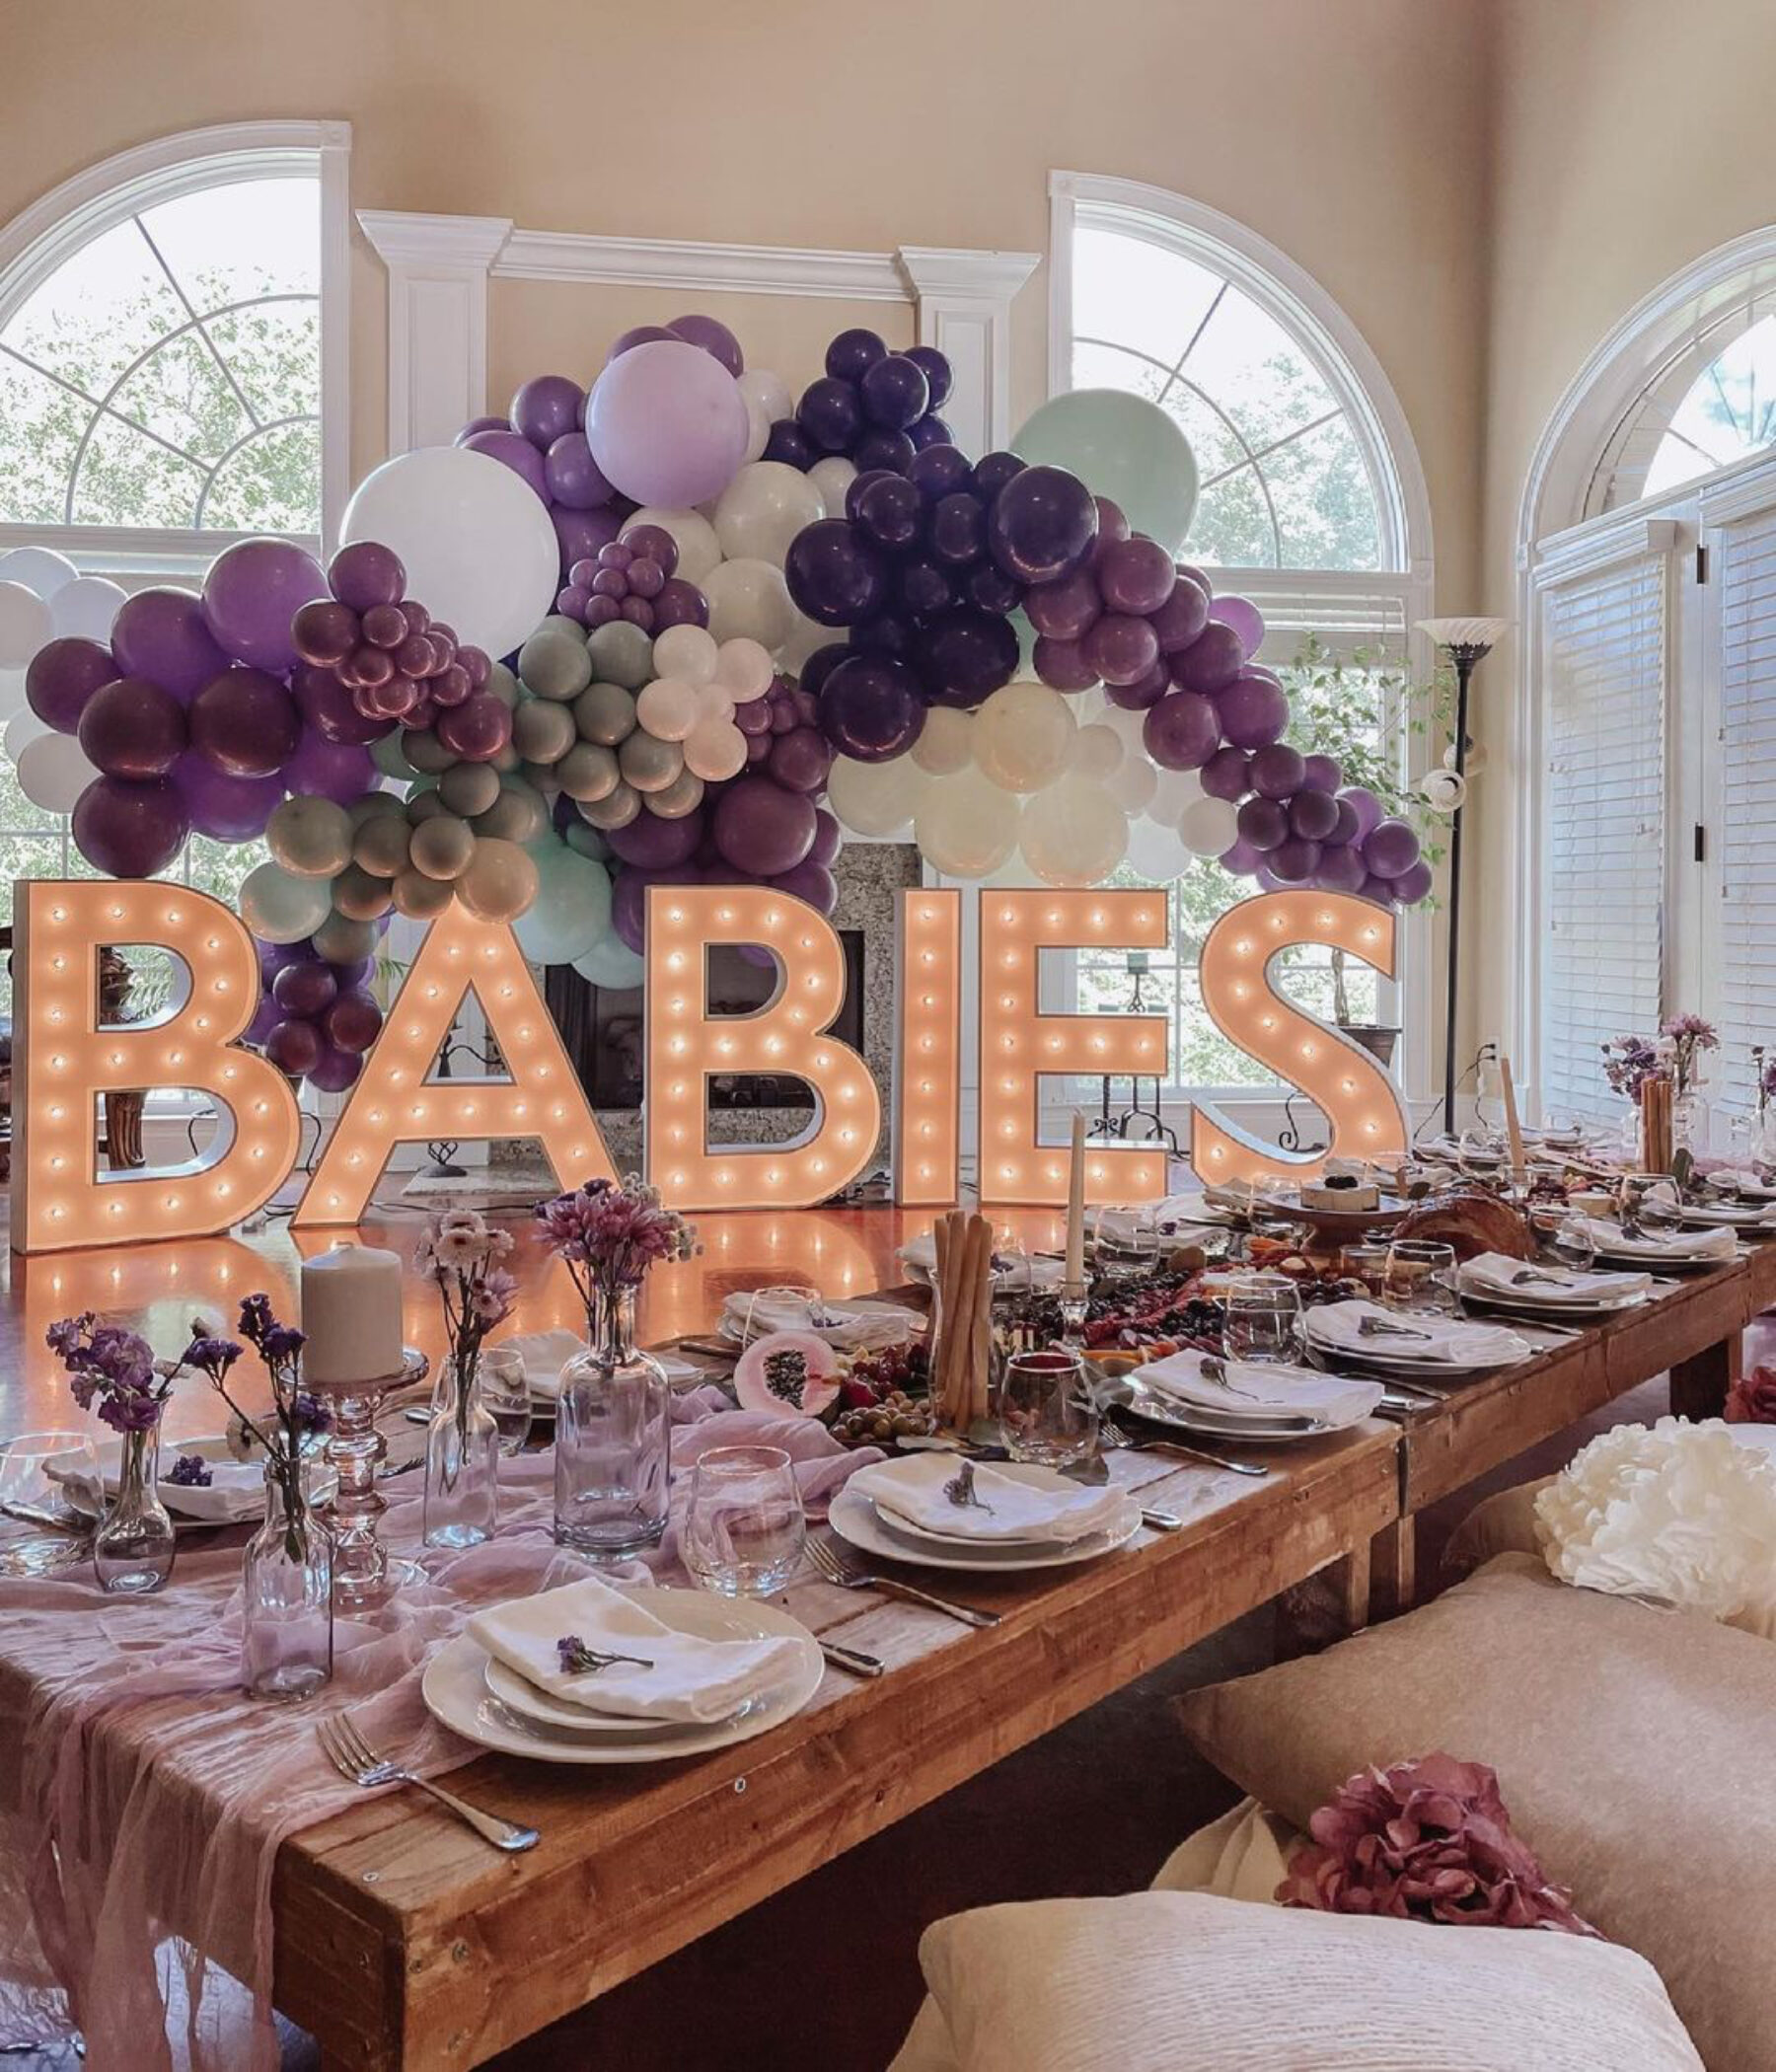 Light Up Your Next Celebration: Meet Letter Bright   Nashville Baby Guide